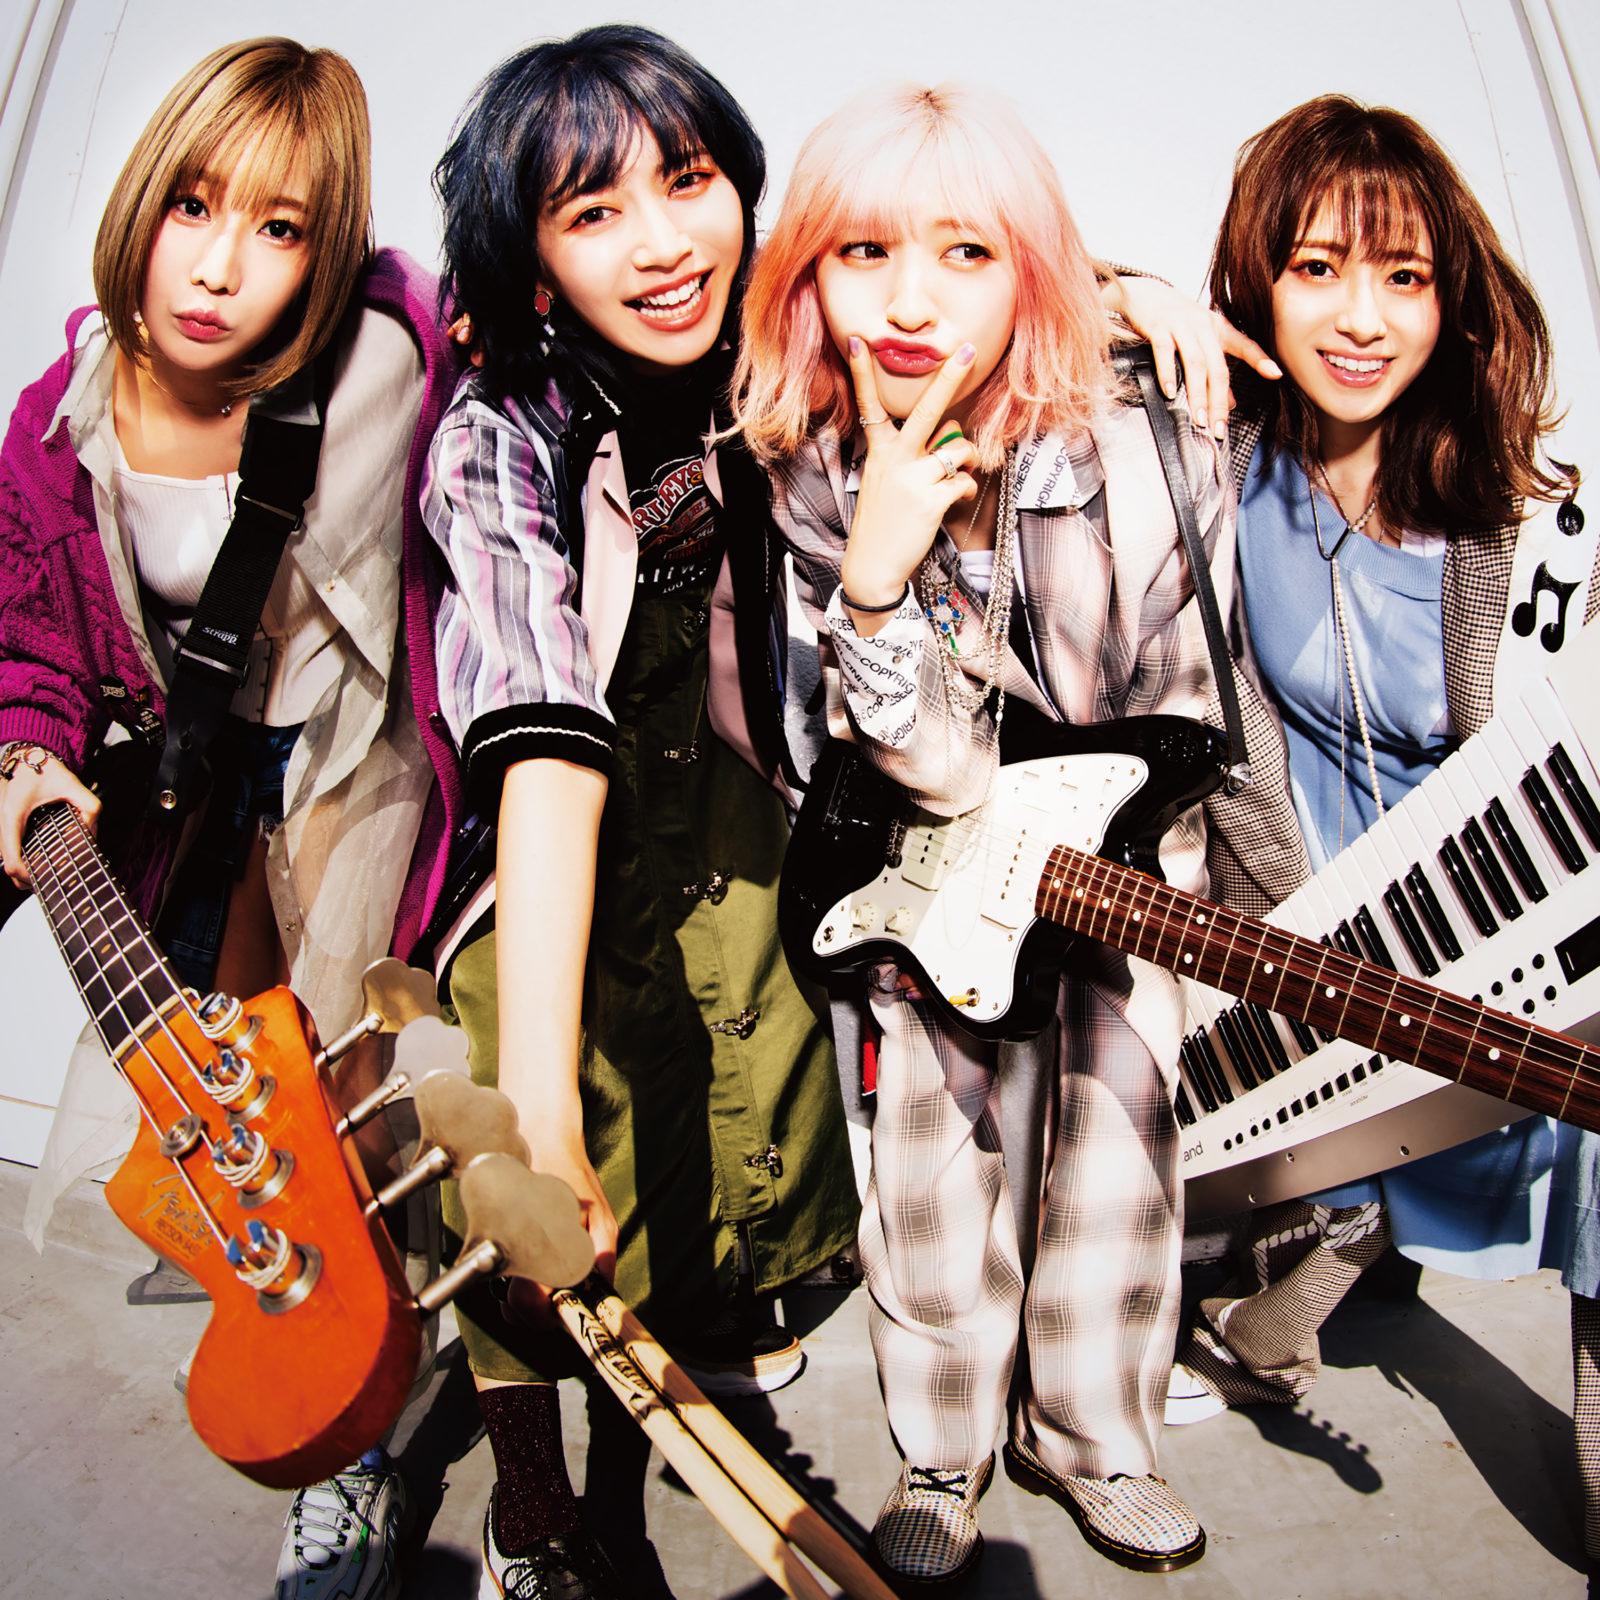 SILENT SIREN、バンド結成10周年記念して過去の映像作品を期間限定で公開中!第2弾は2015年 東京体育館公演と、2016年横浜アリーナサムネイル画像